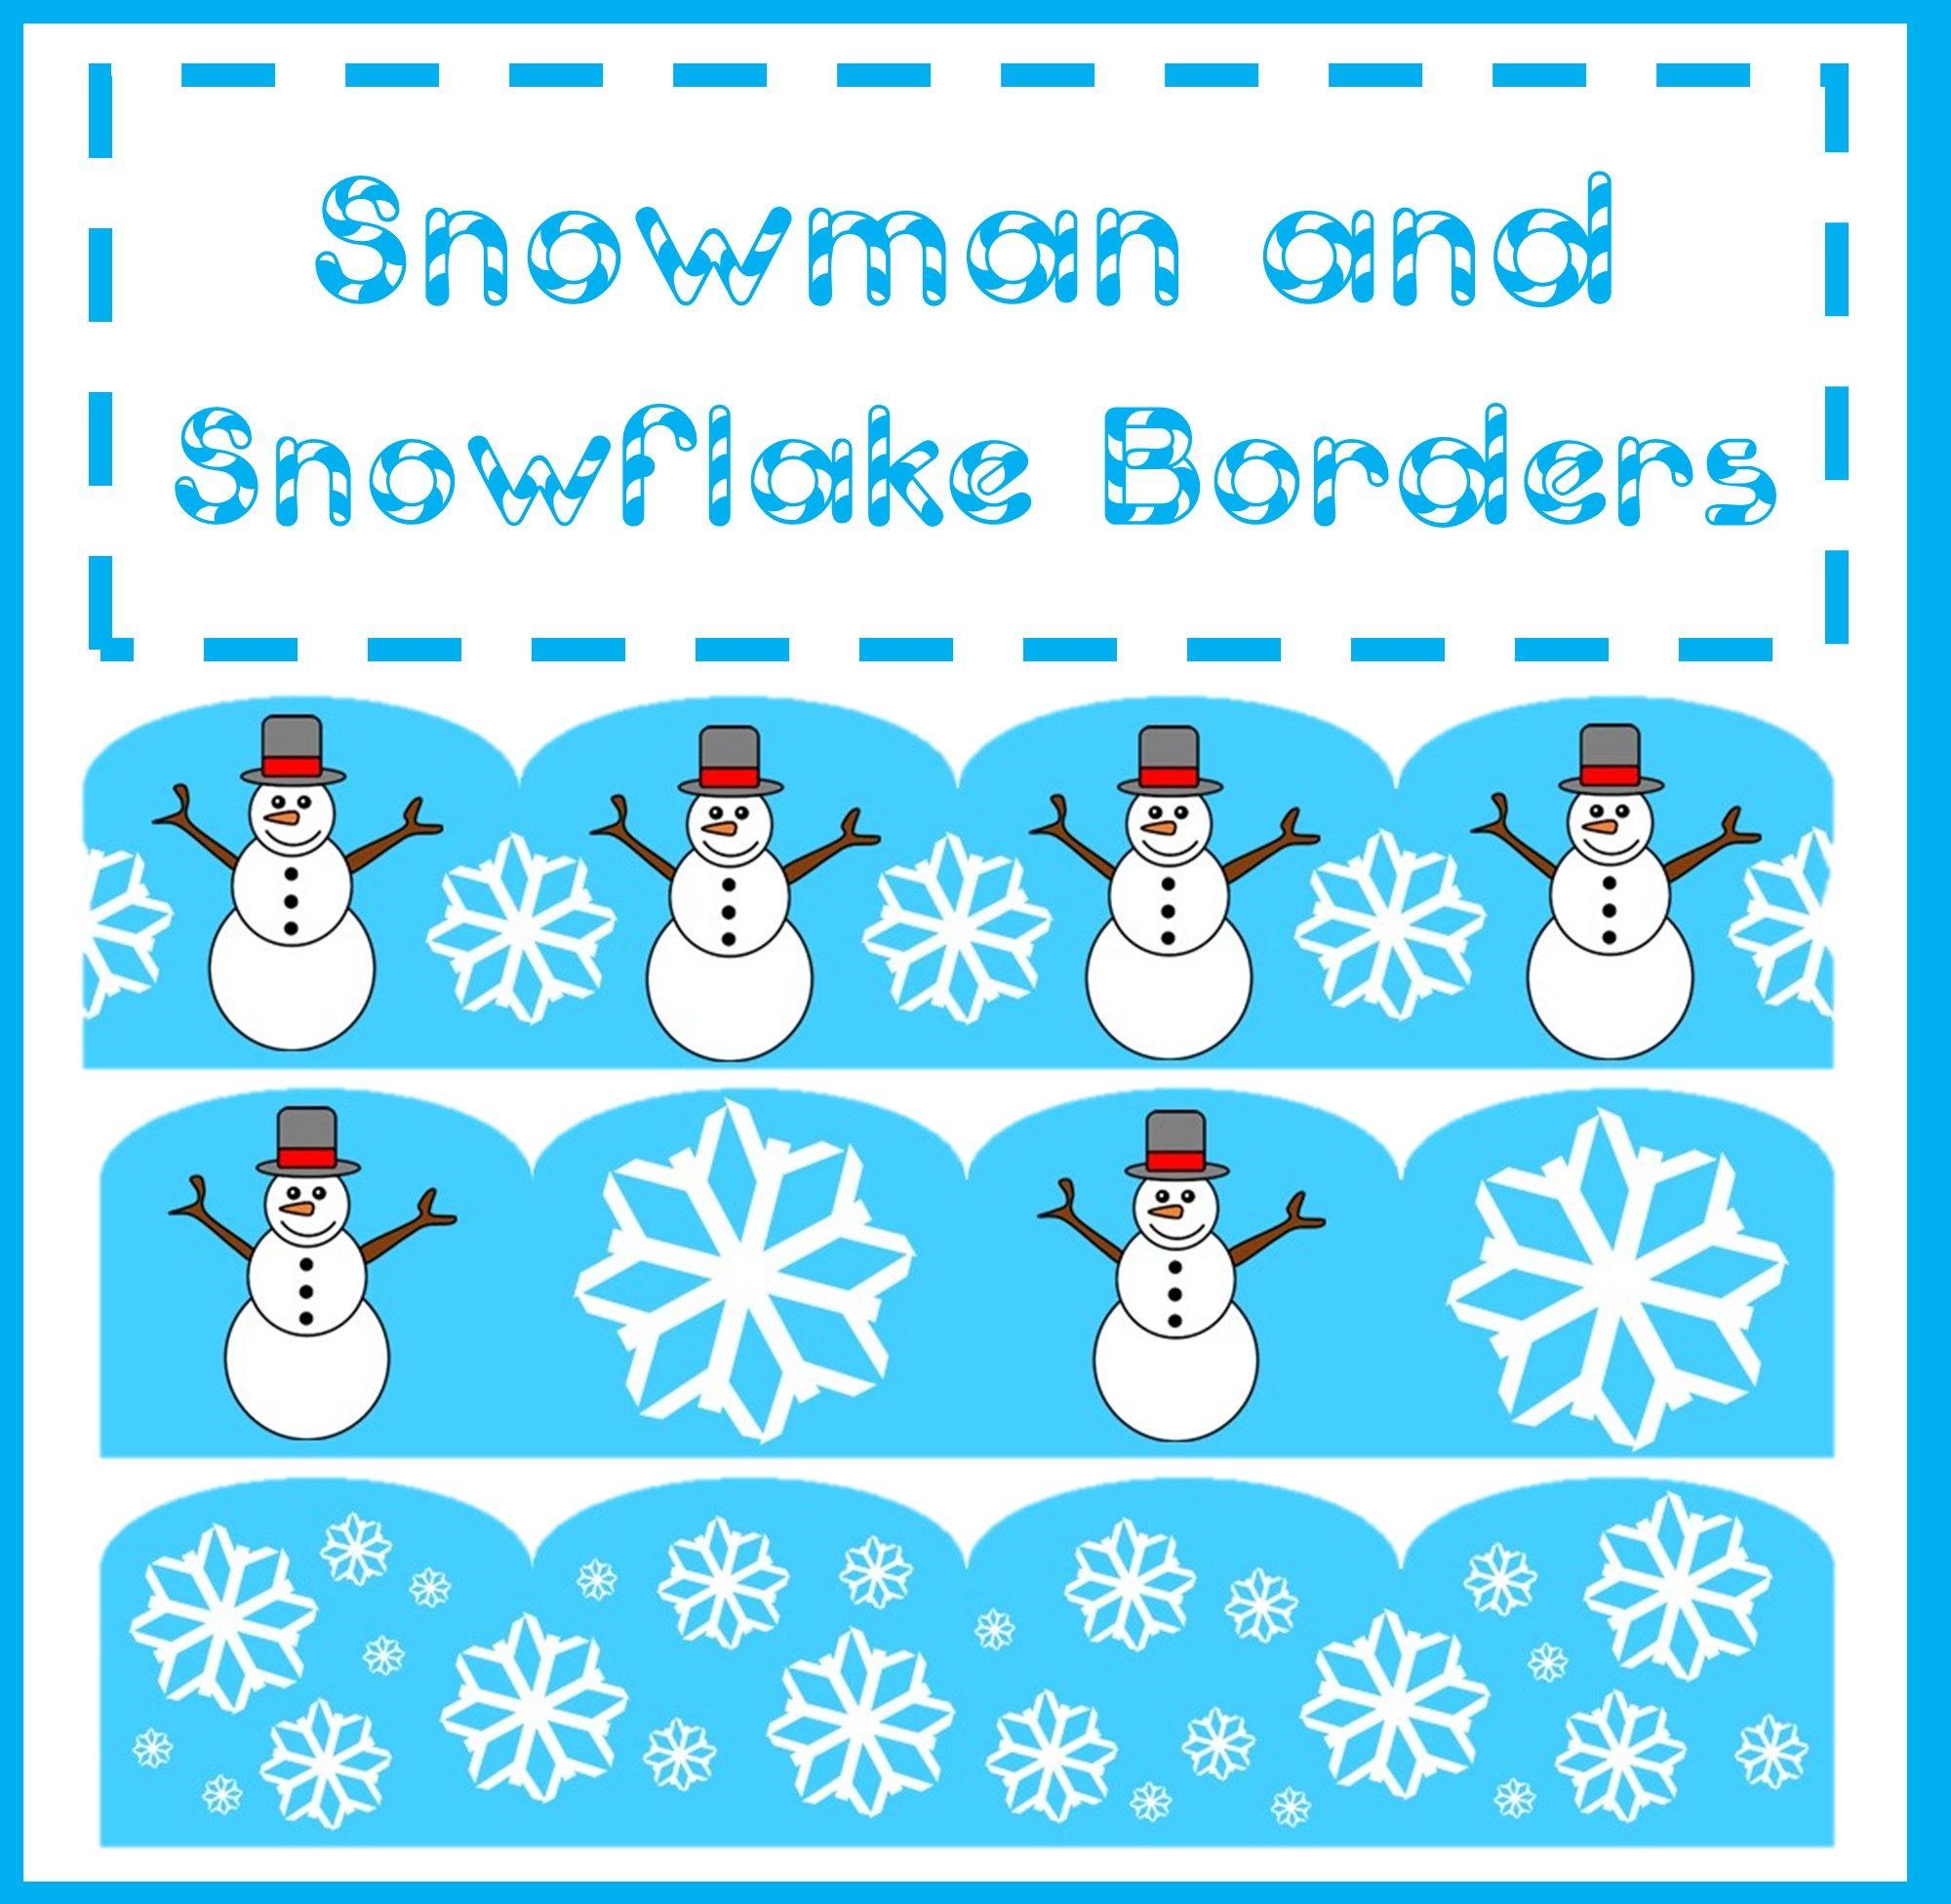 Very Cute Christmas Snowman And Snowflake Borders! Make Any Bulletin - Free Printable Christmas Bulletin Board Borders